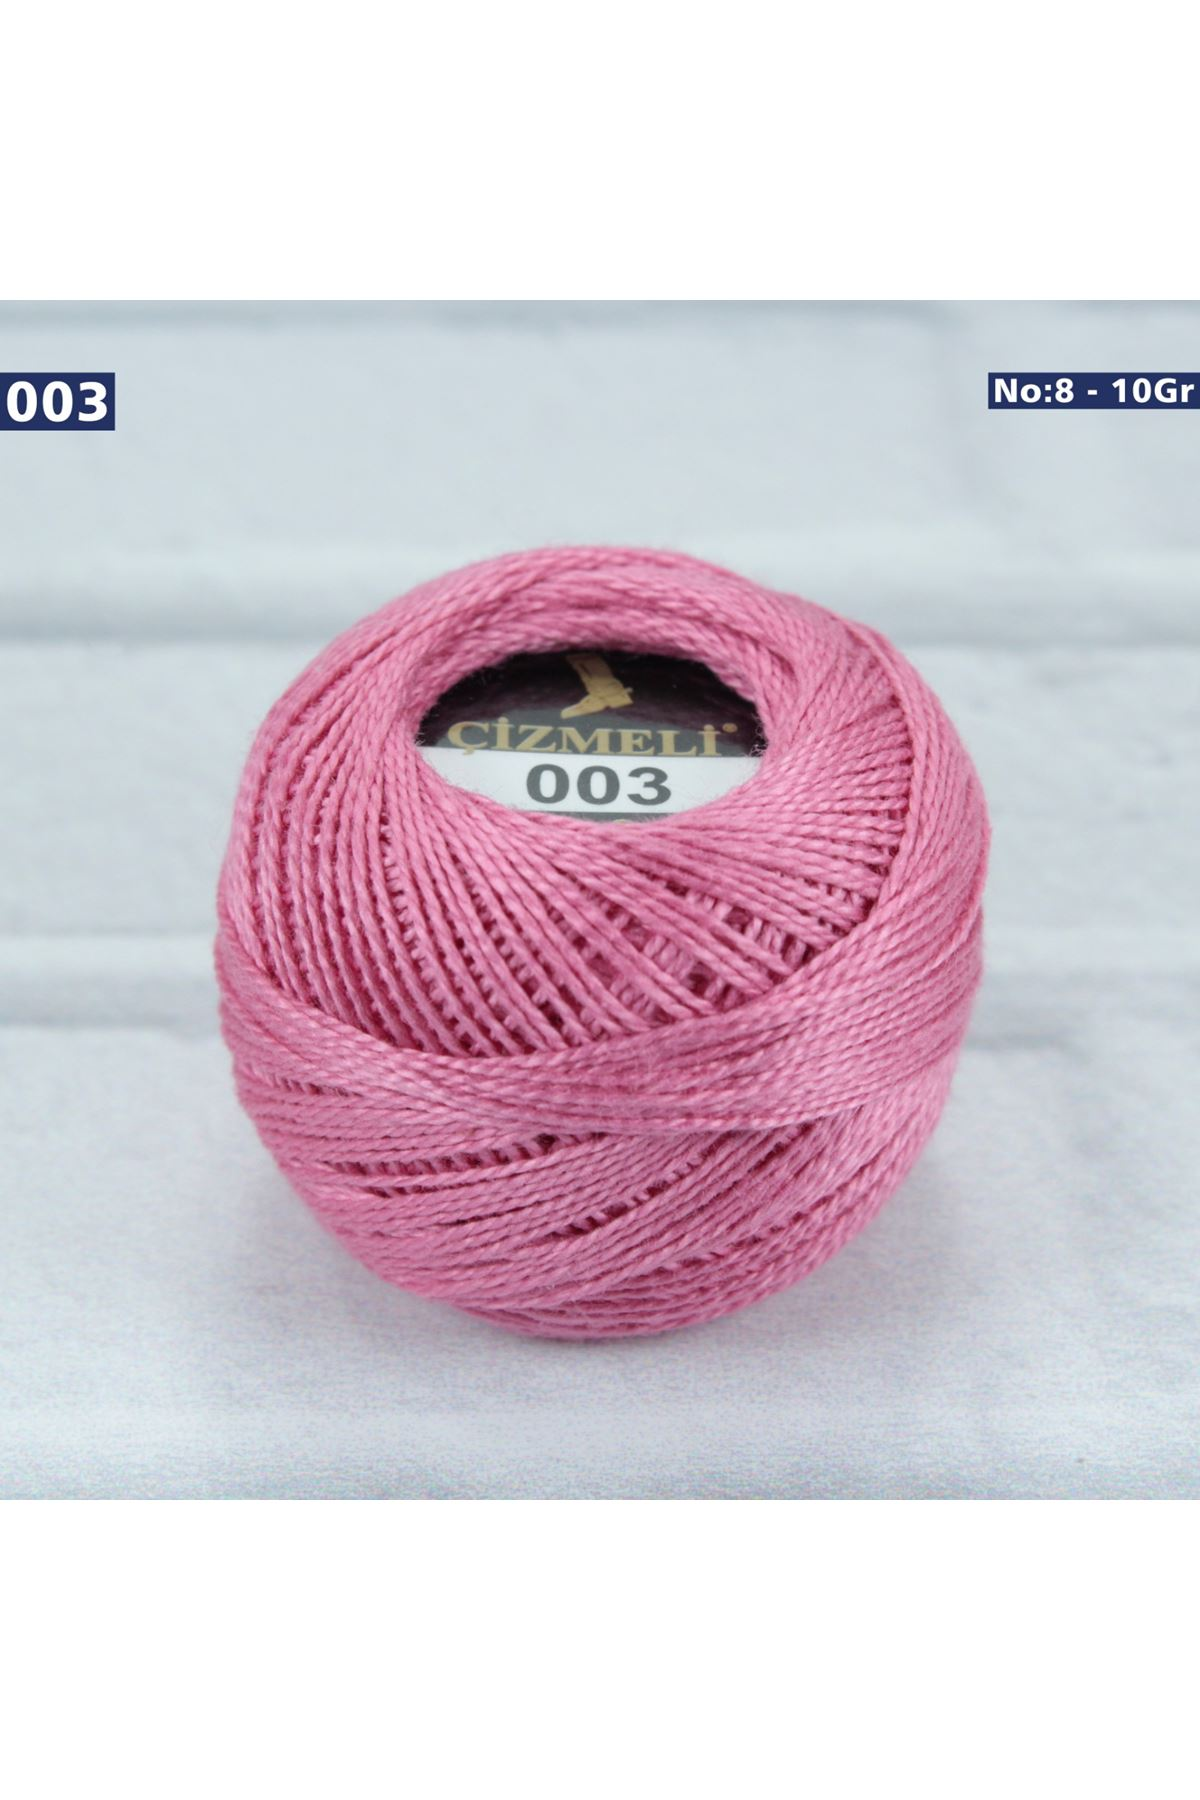 Çizmeli Cotton Perle Nakış İpliği No: 003